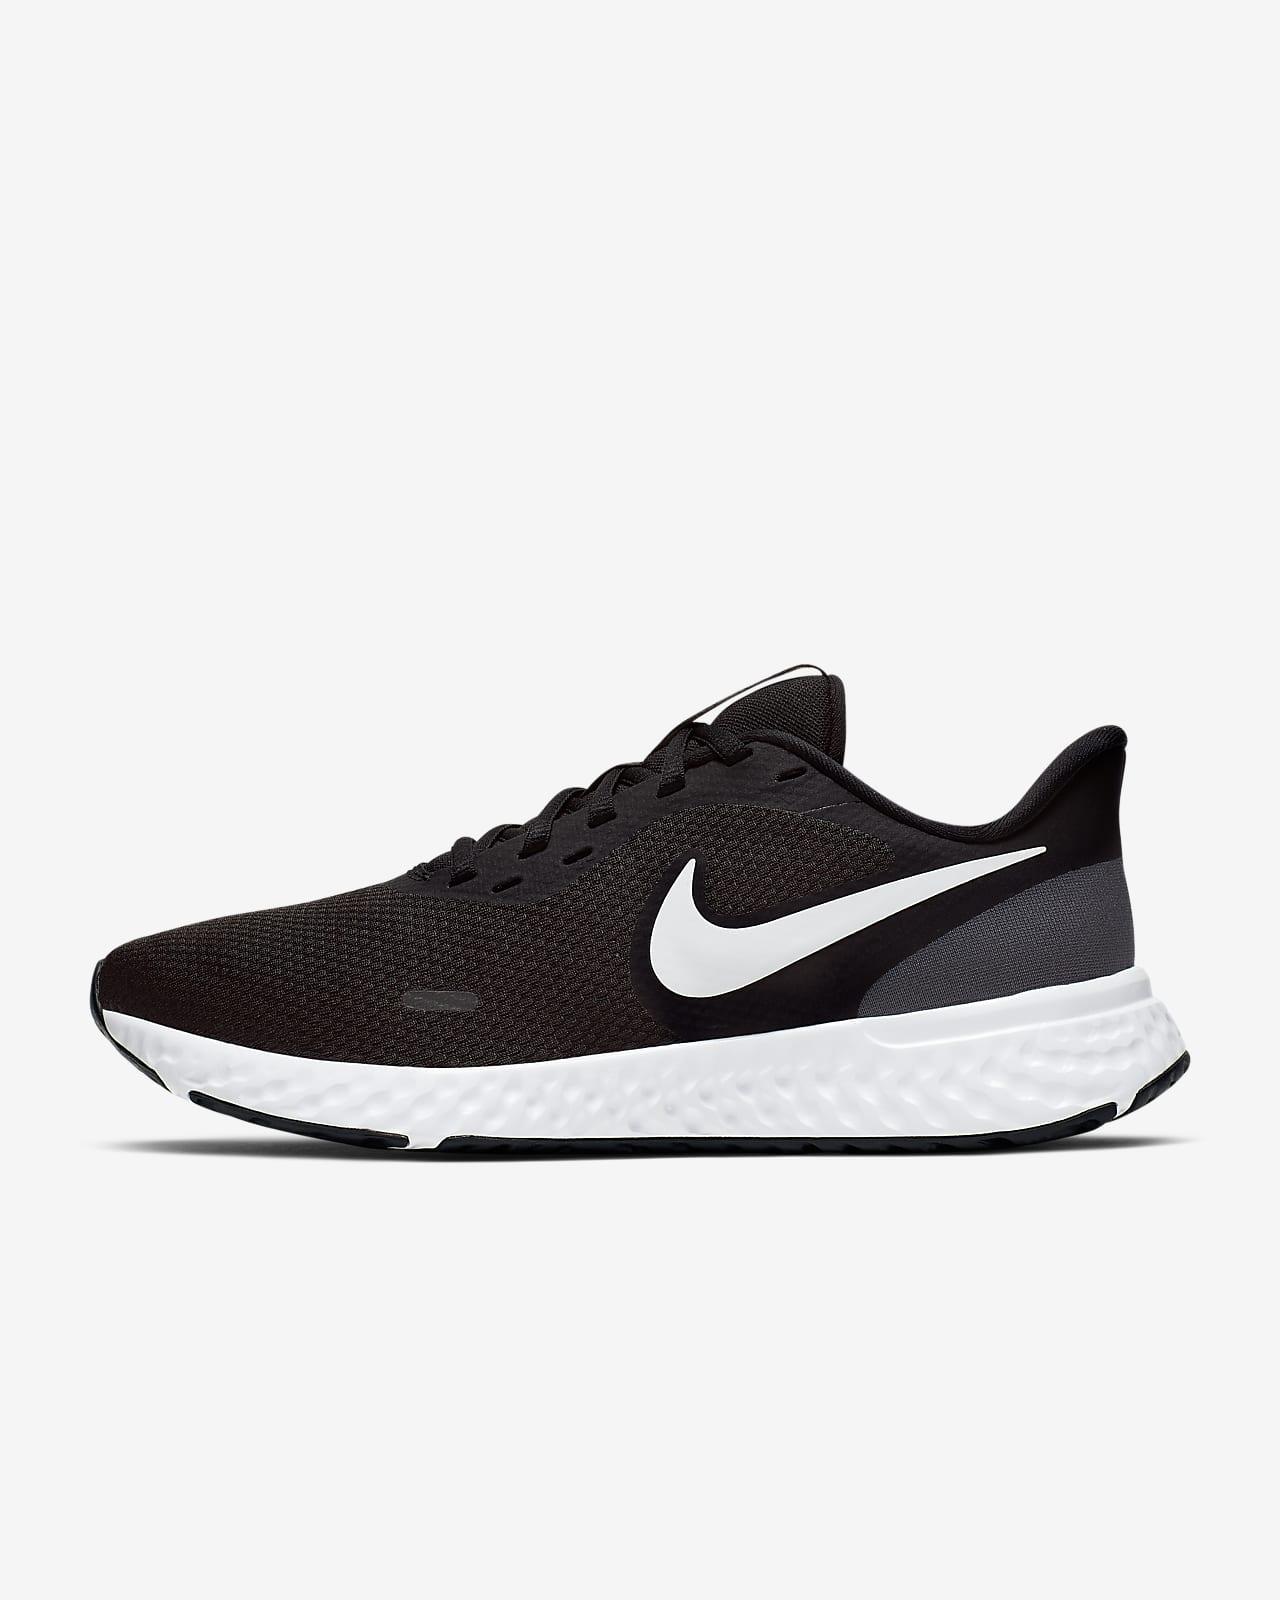 Sapatilhas de running Nike Revolution 5 para mulher